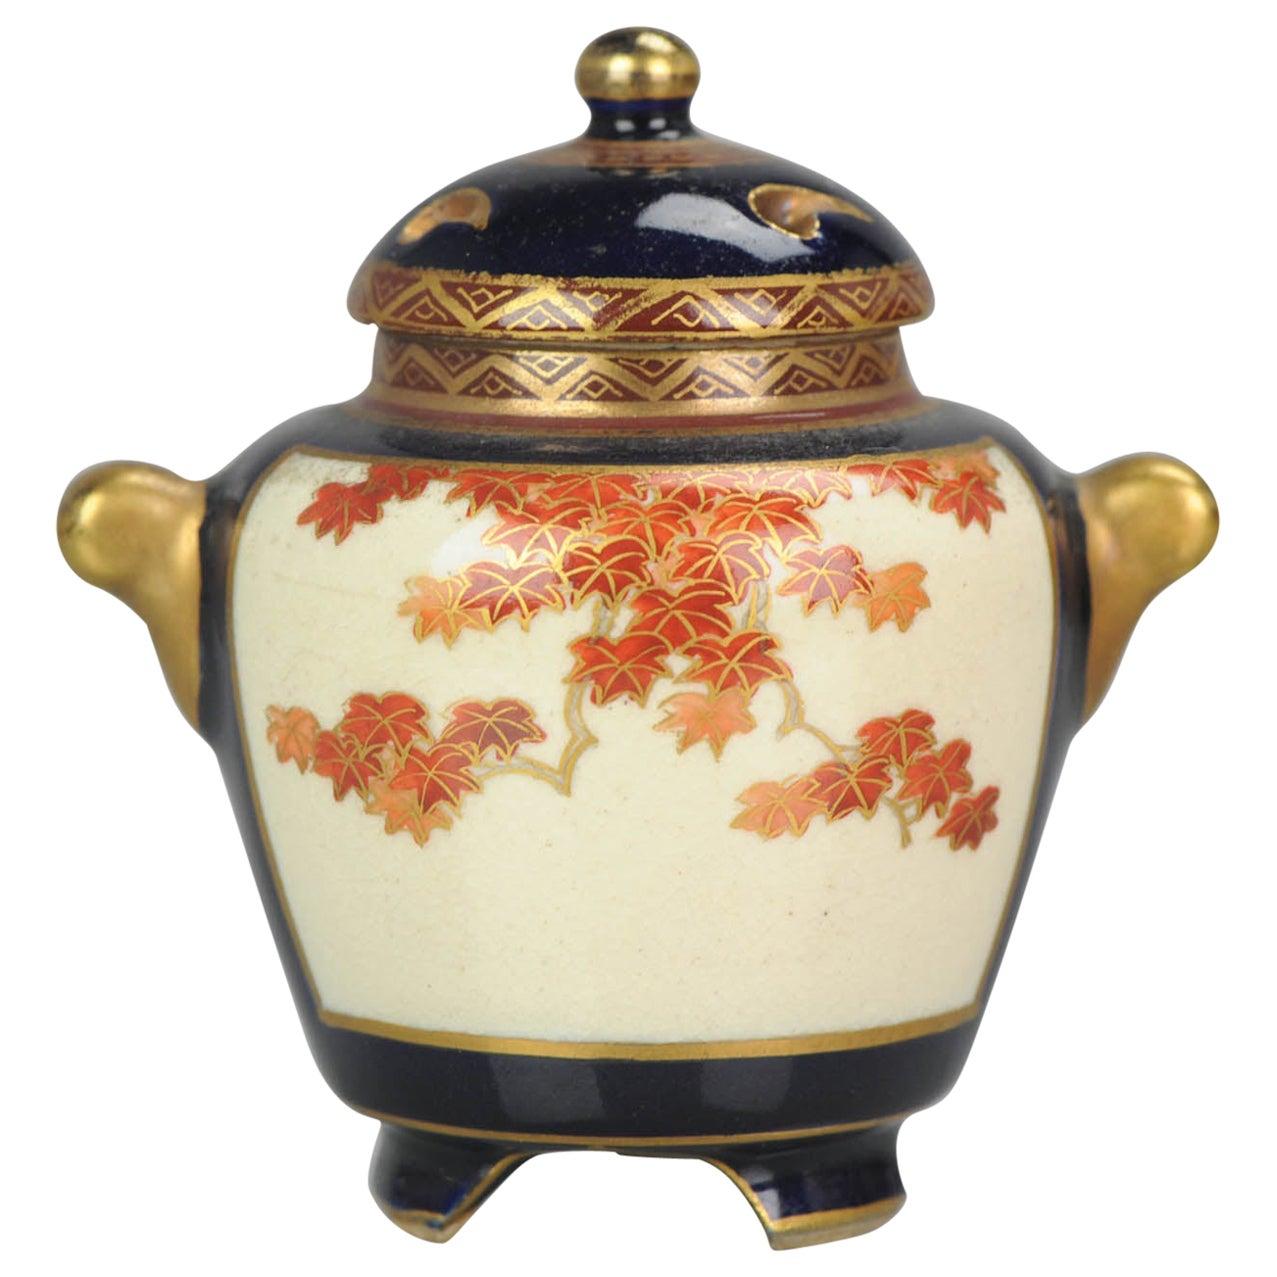 Antique Japanese Satsuma Mini Koro Incense Burner Japan Meiji Period